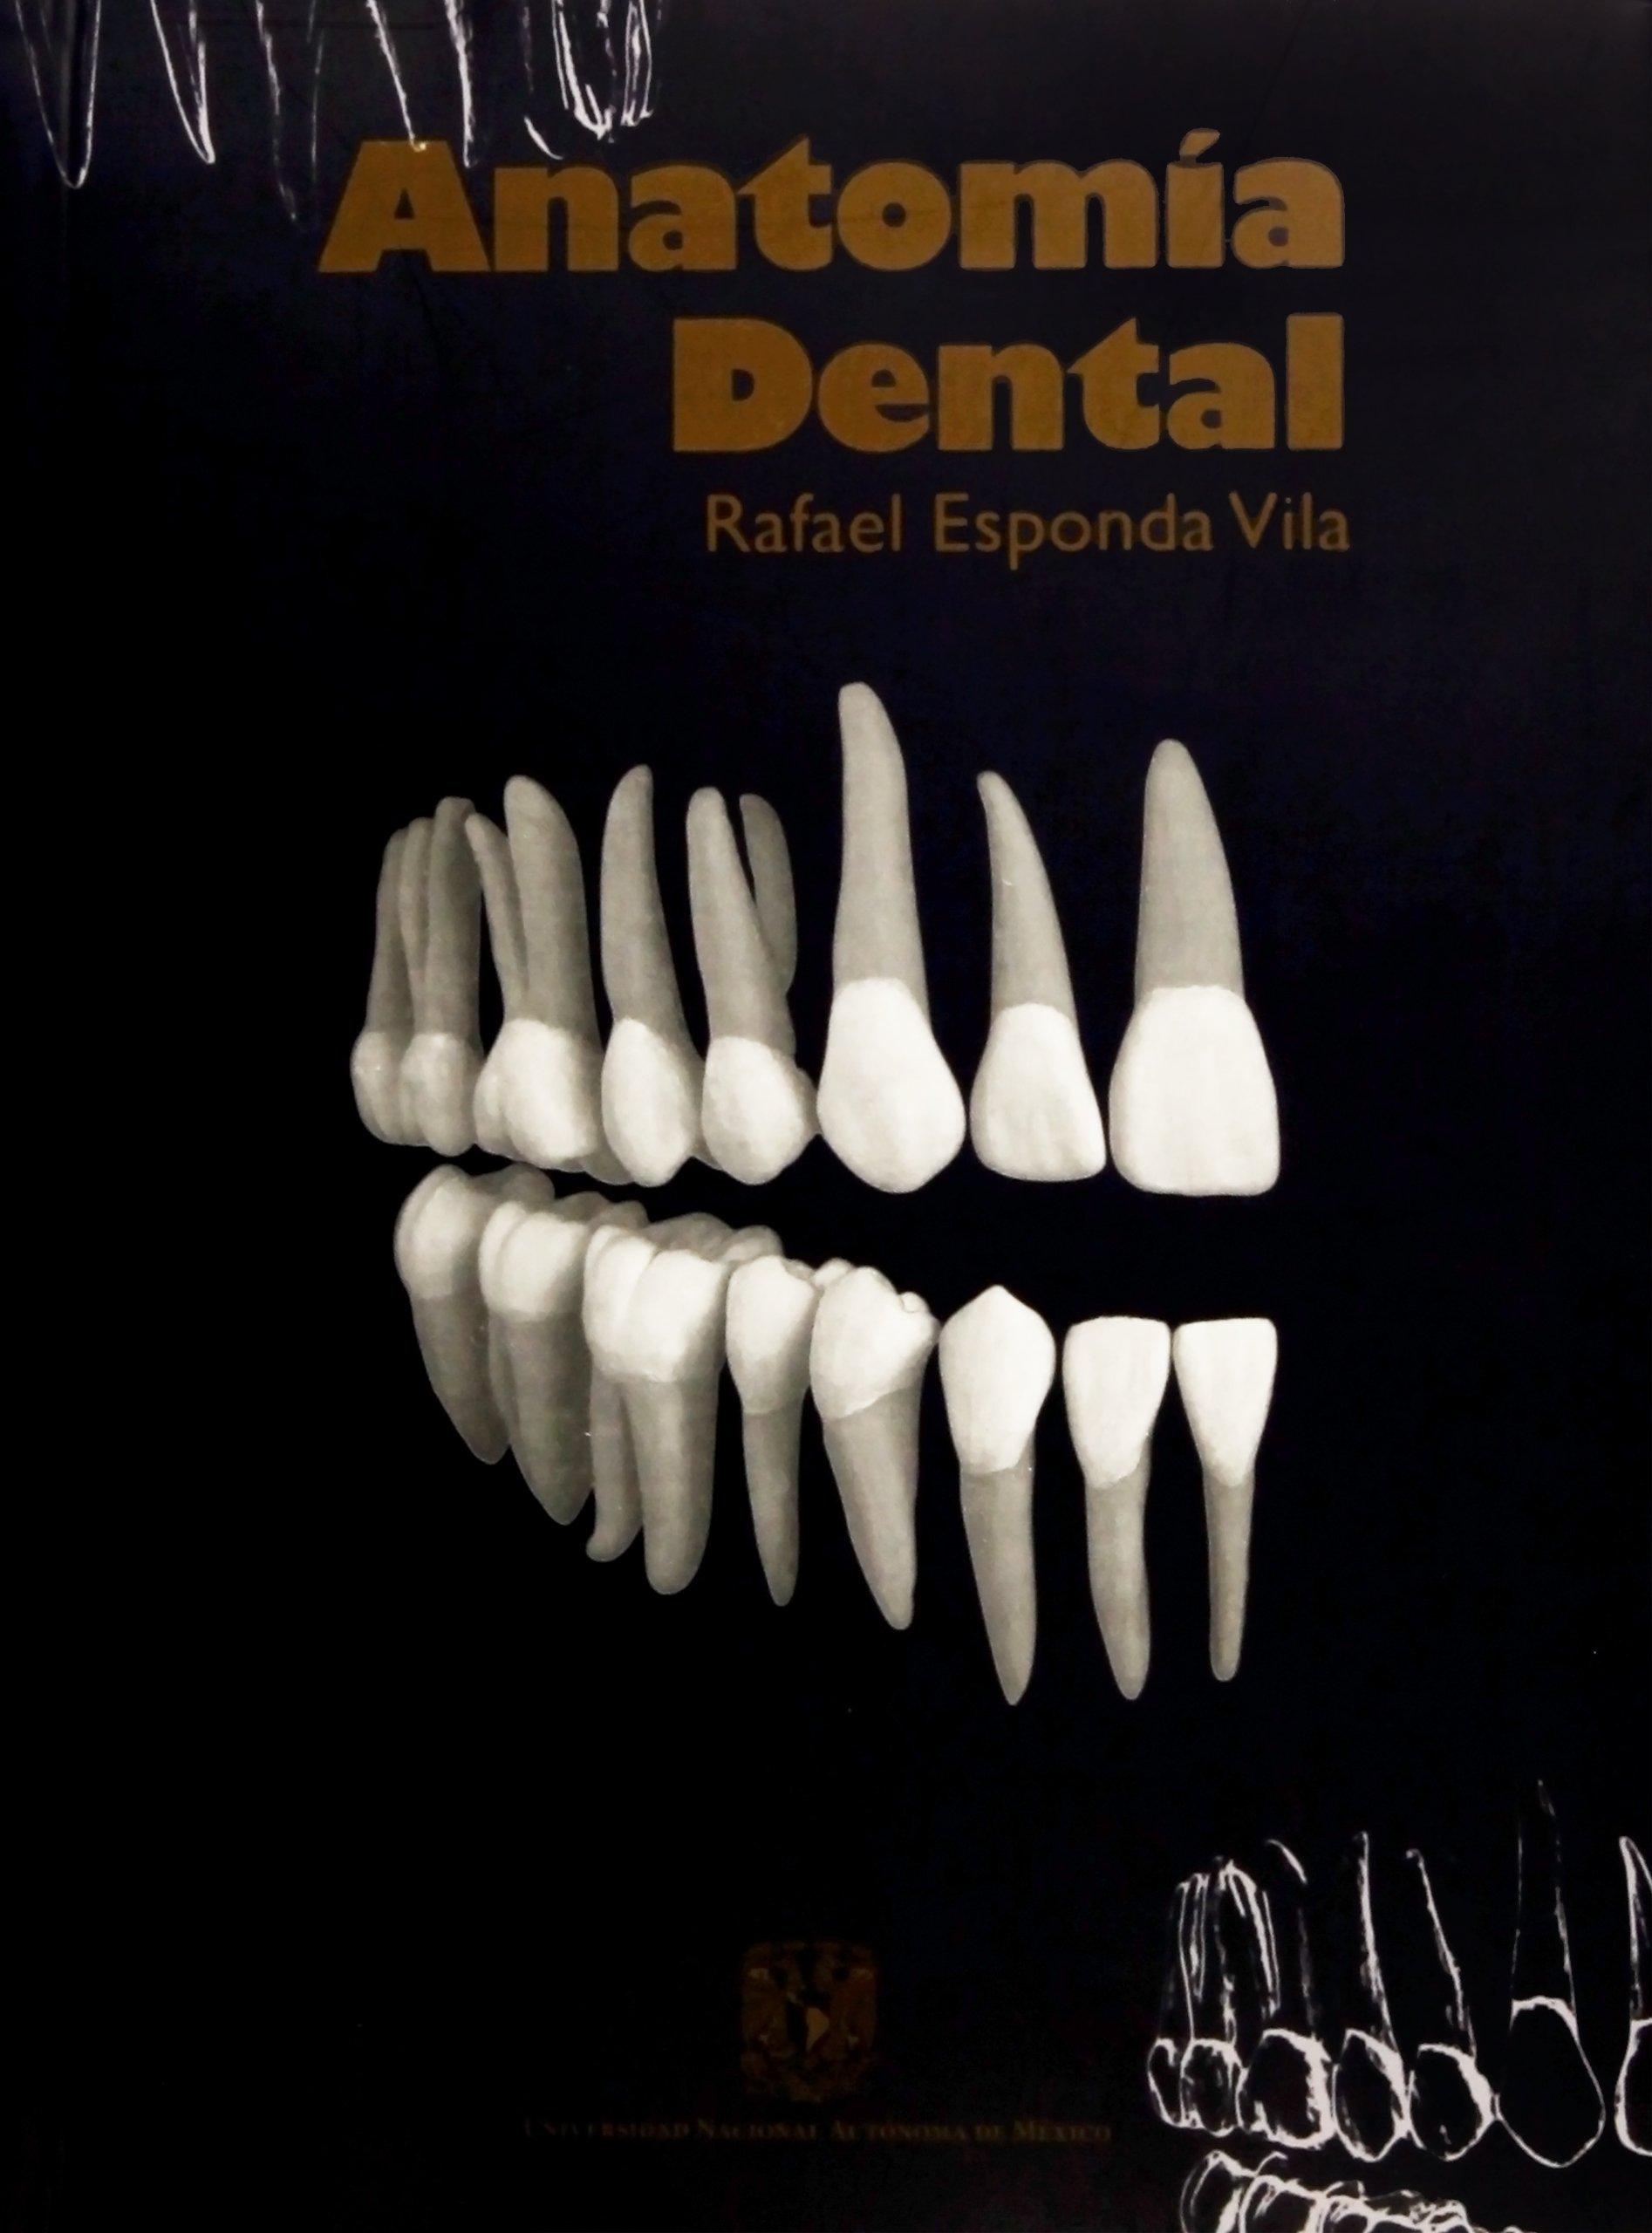 Anatomía dental: Rafael Esponda Vila: Amazon.com.mx: Libros